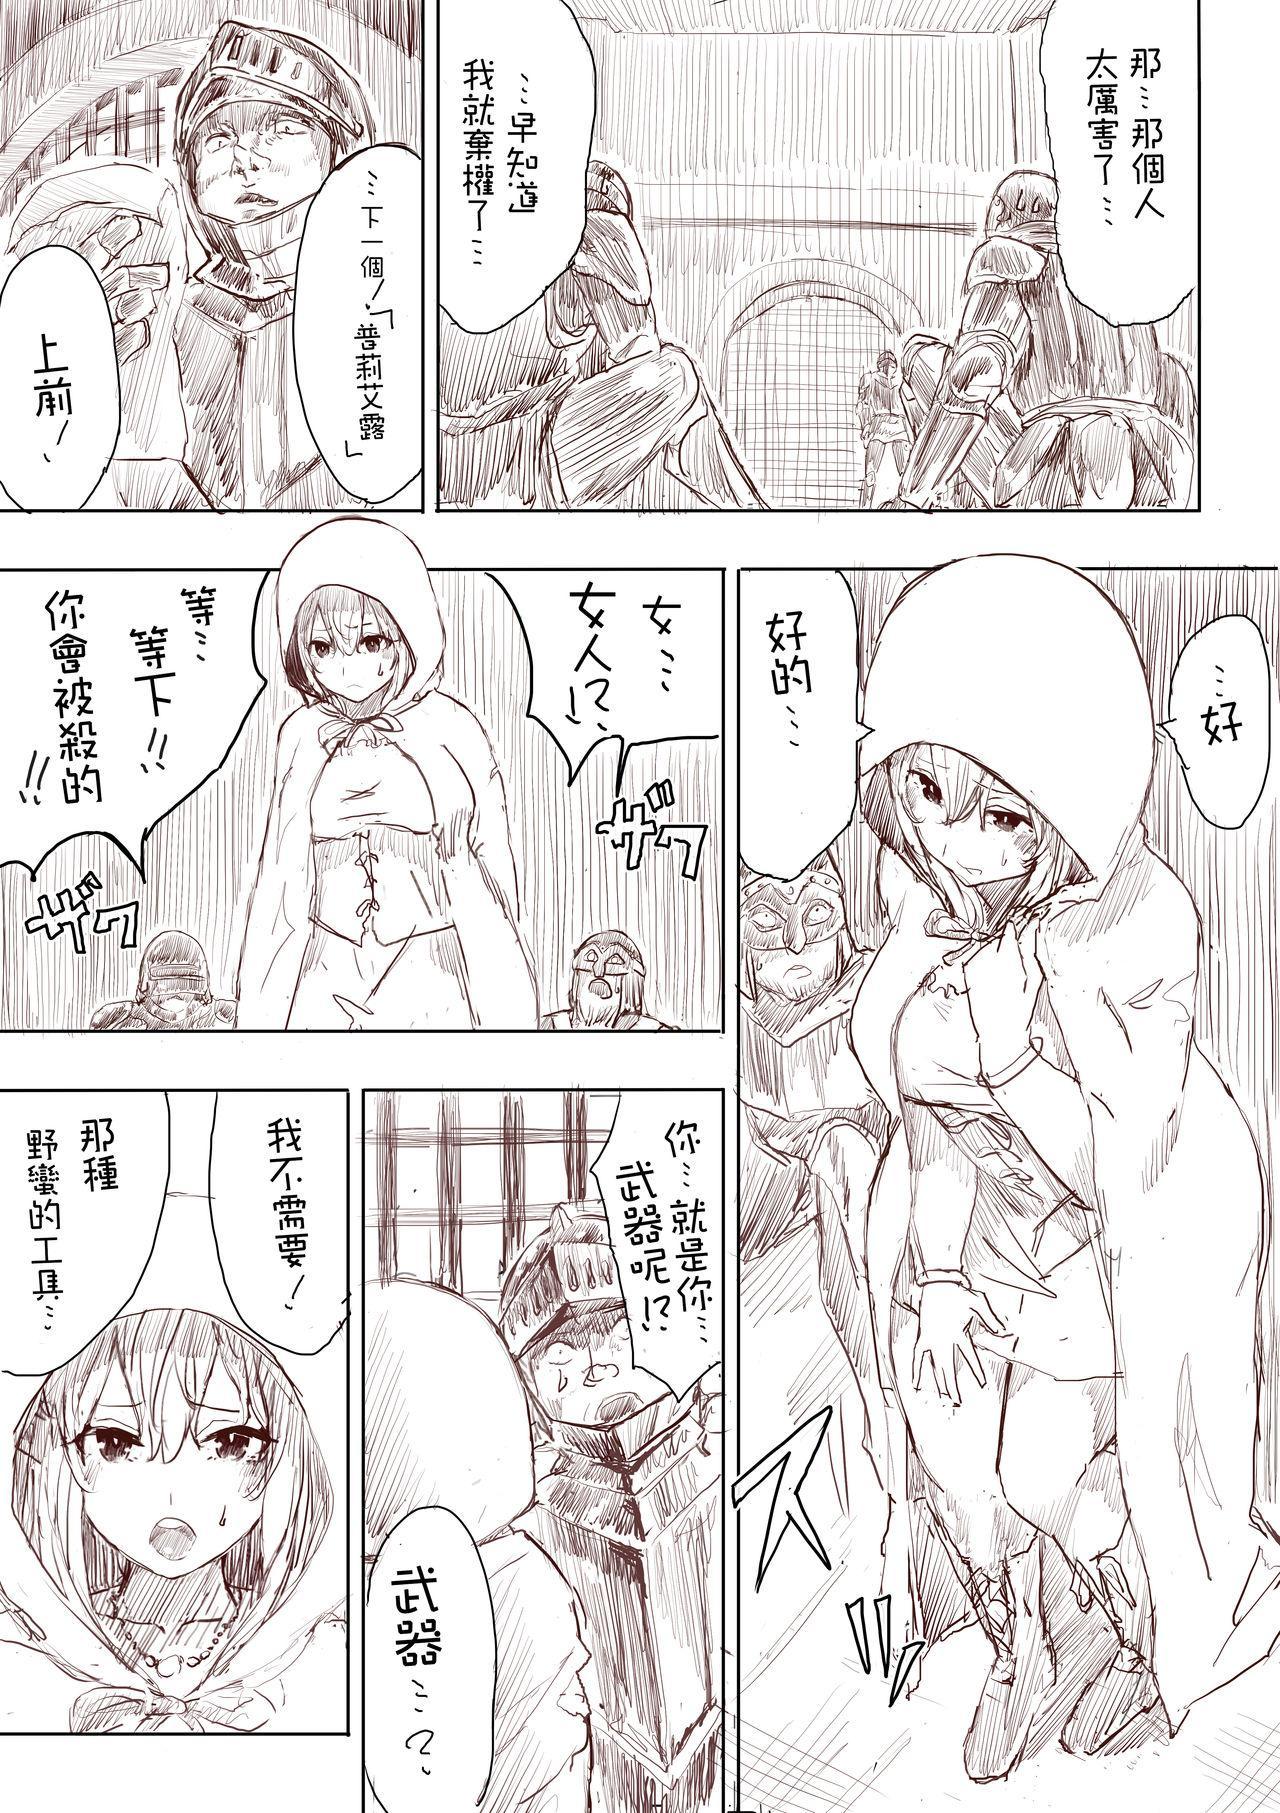 Elf Princess Strikes Back 4